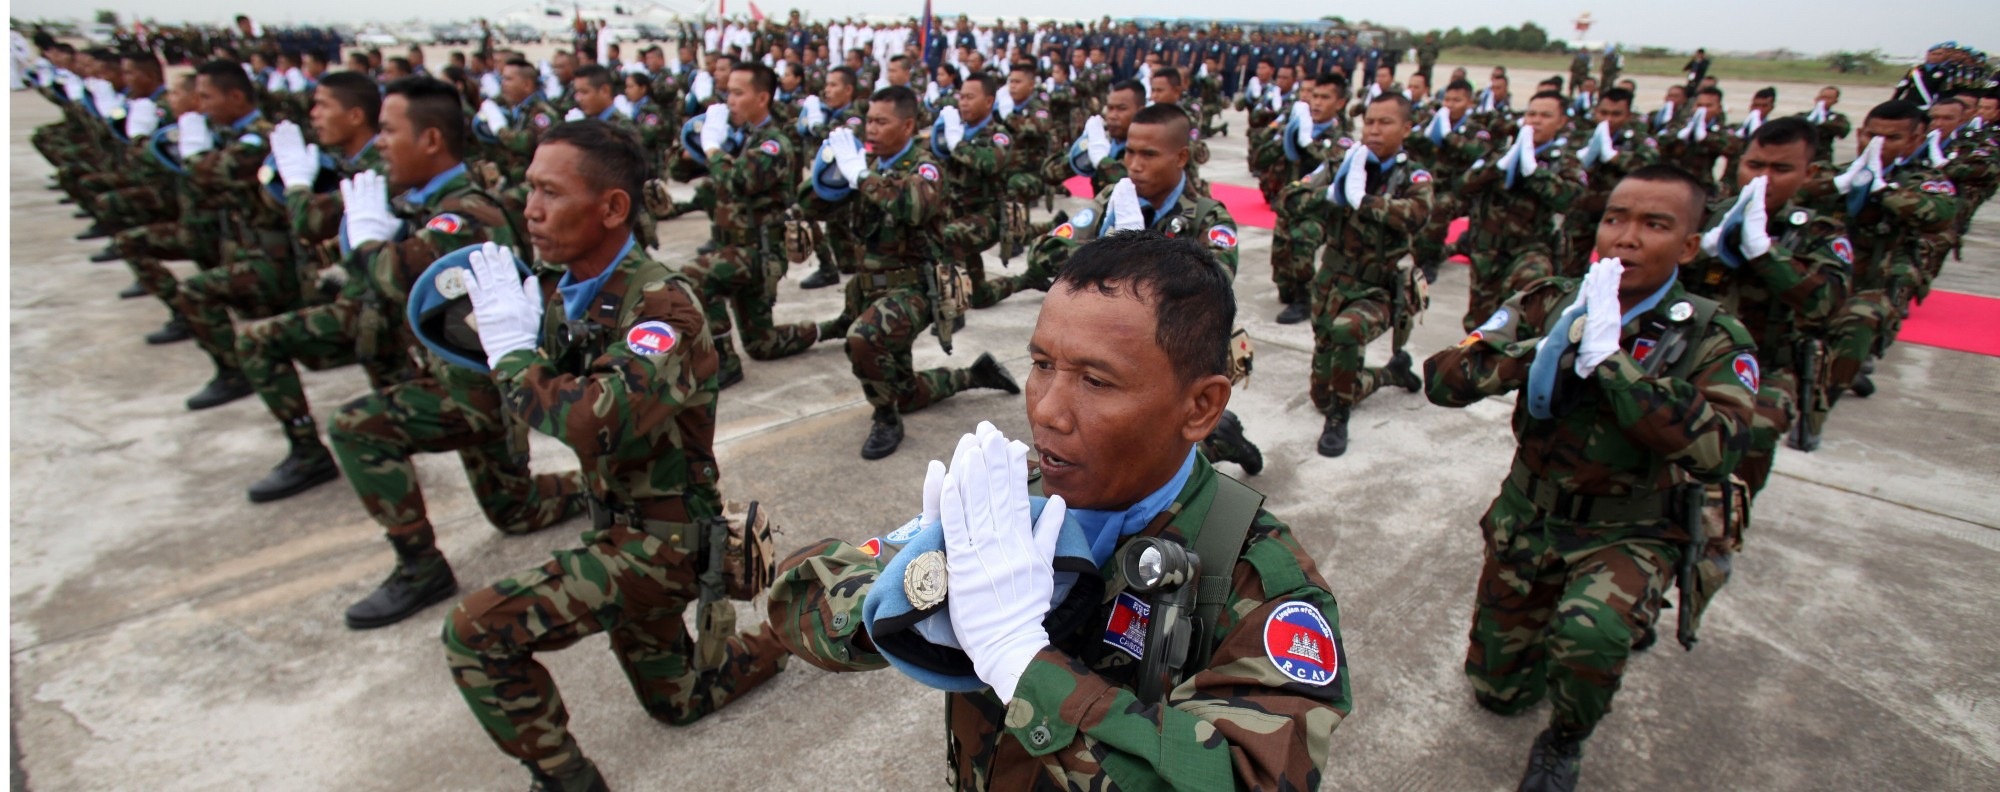 Cambodian troops take an oath. Photo: Xinhua